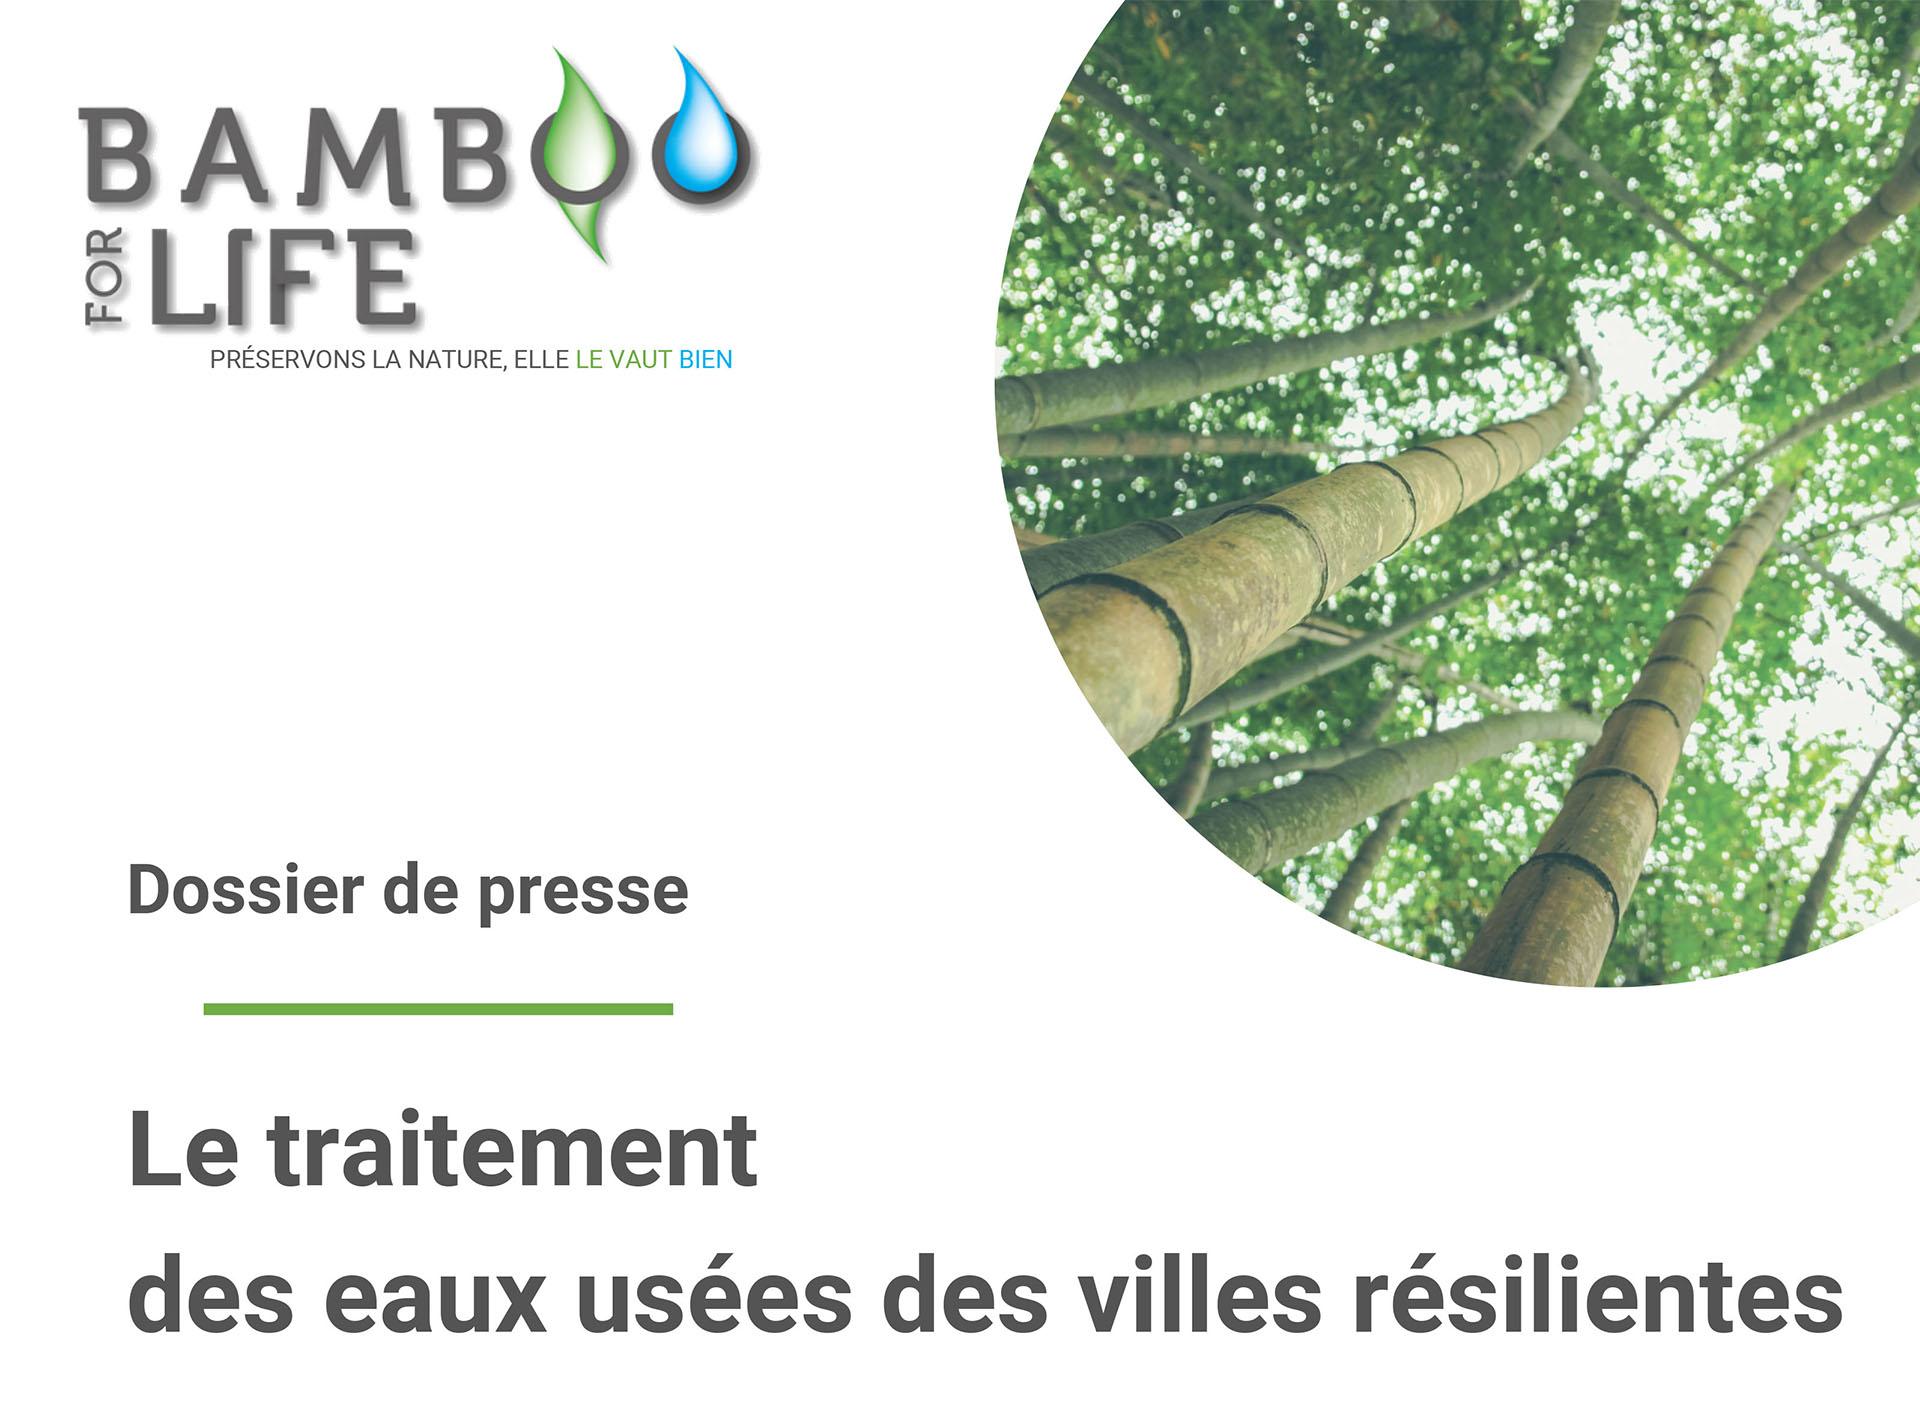 galerie-media-dossier-de-presse-bamboo-for-life